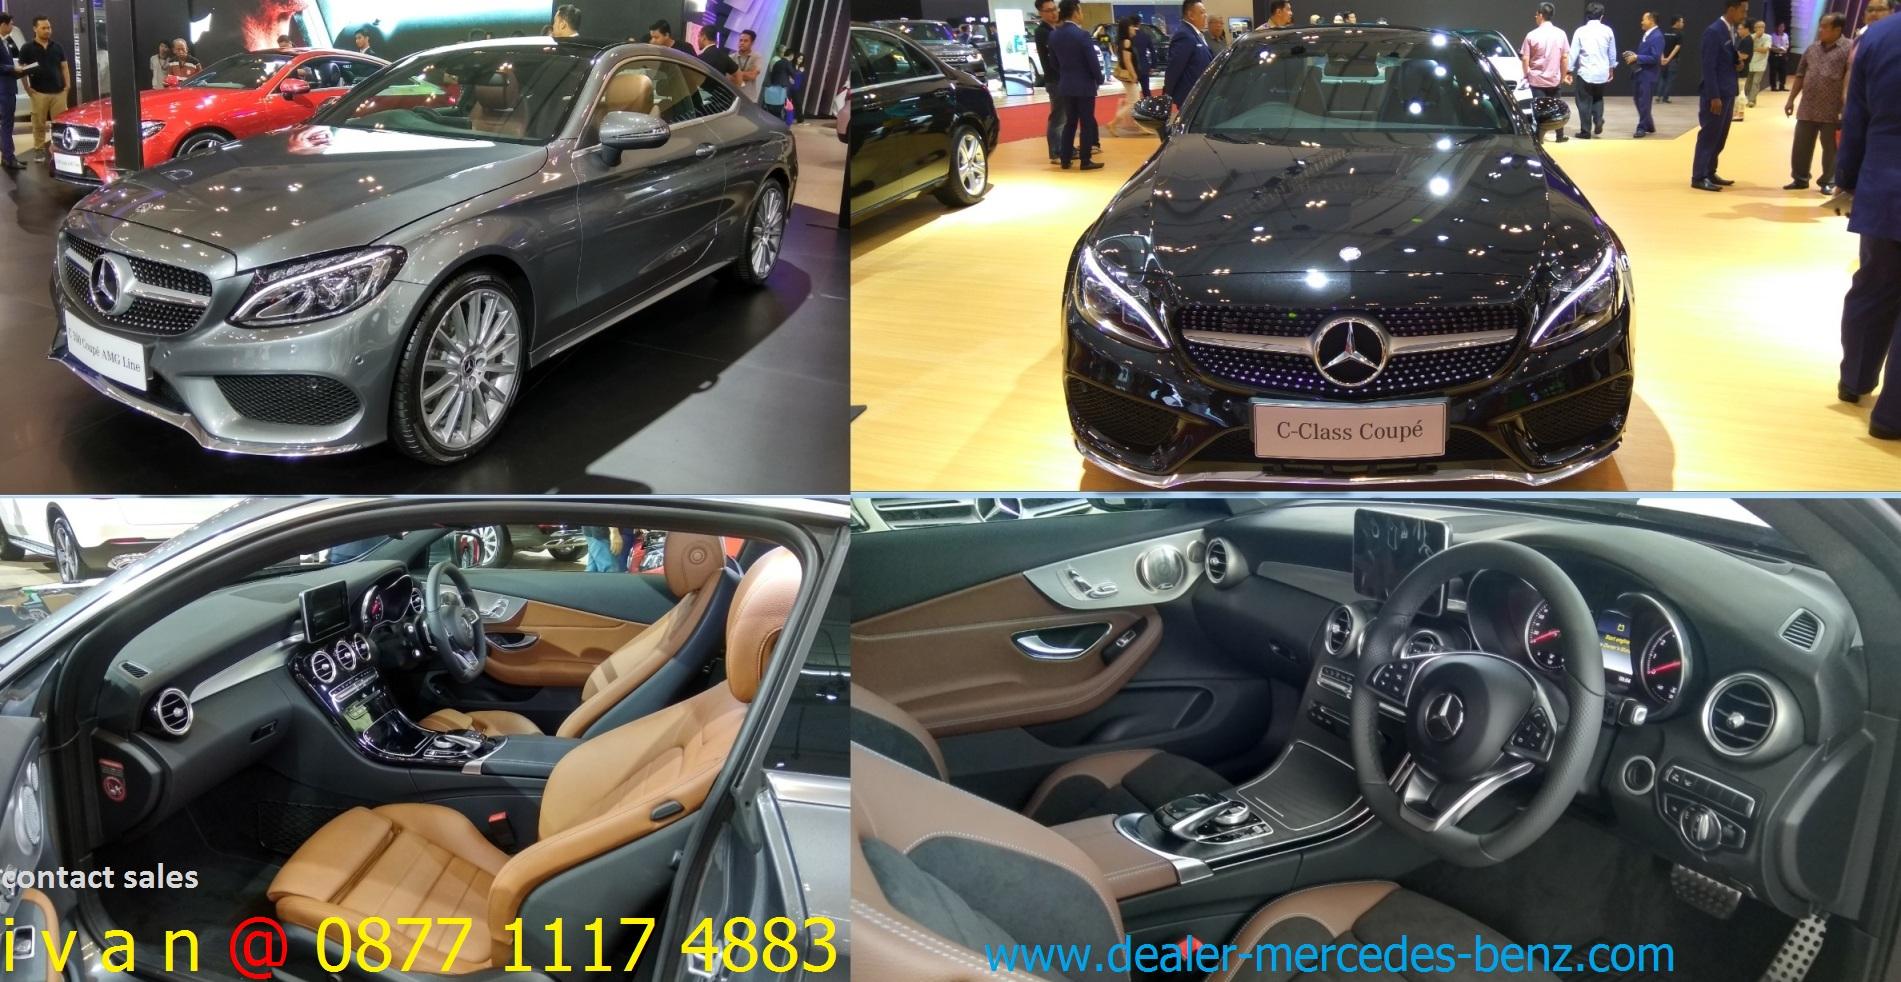 Mercedes Benz C Coupe 2018 Indonesia Dealer Mercedes